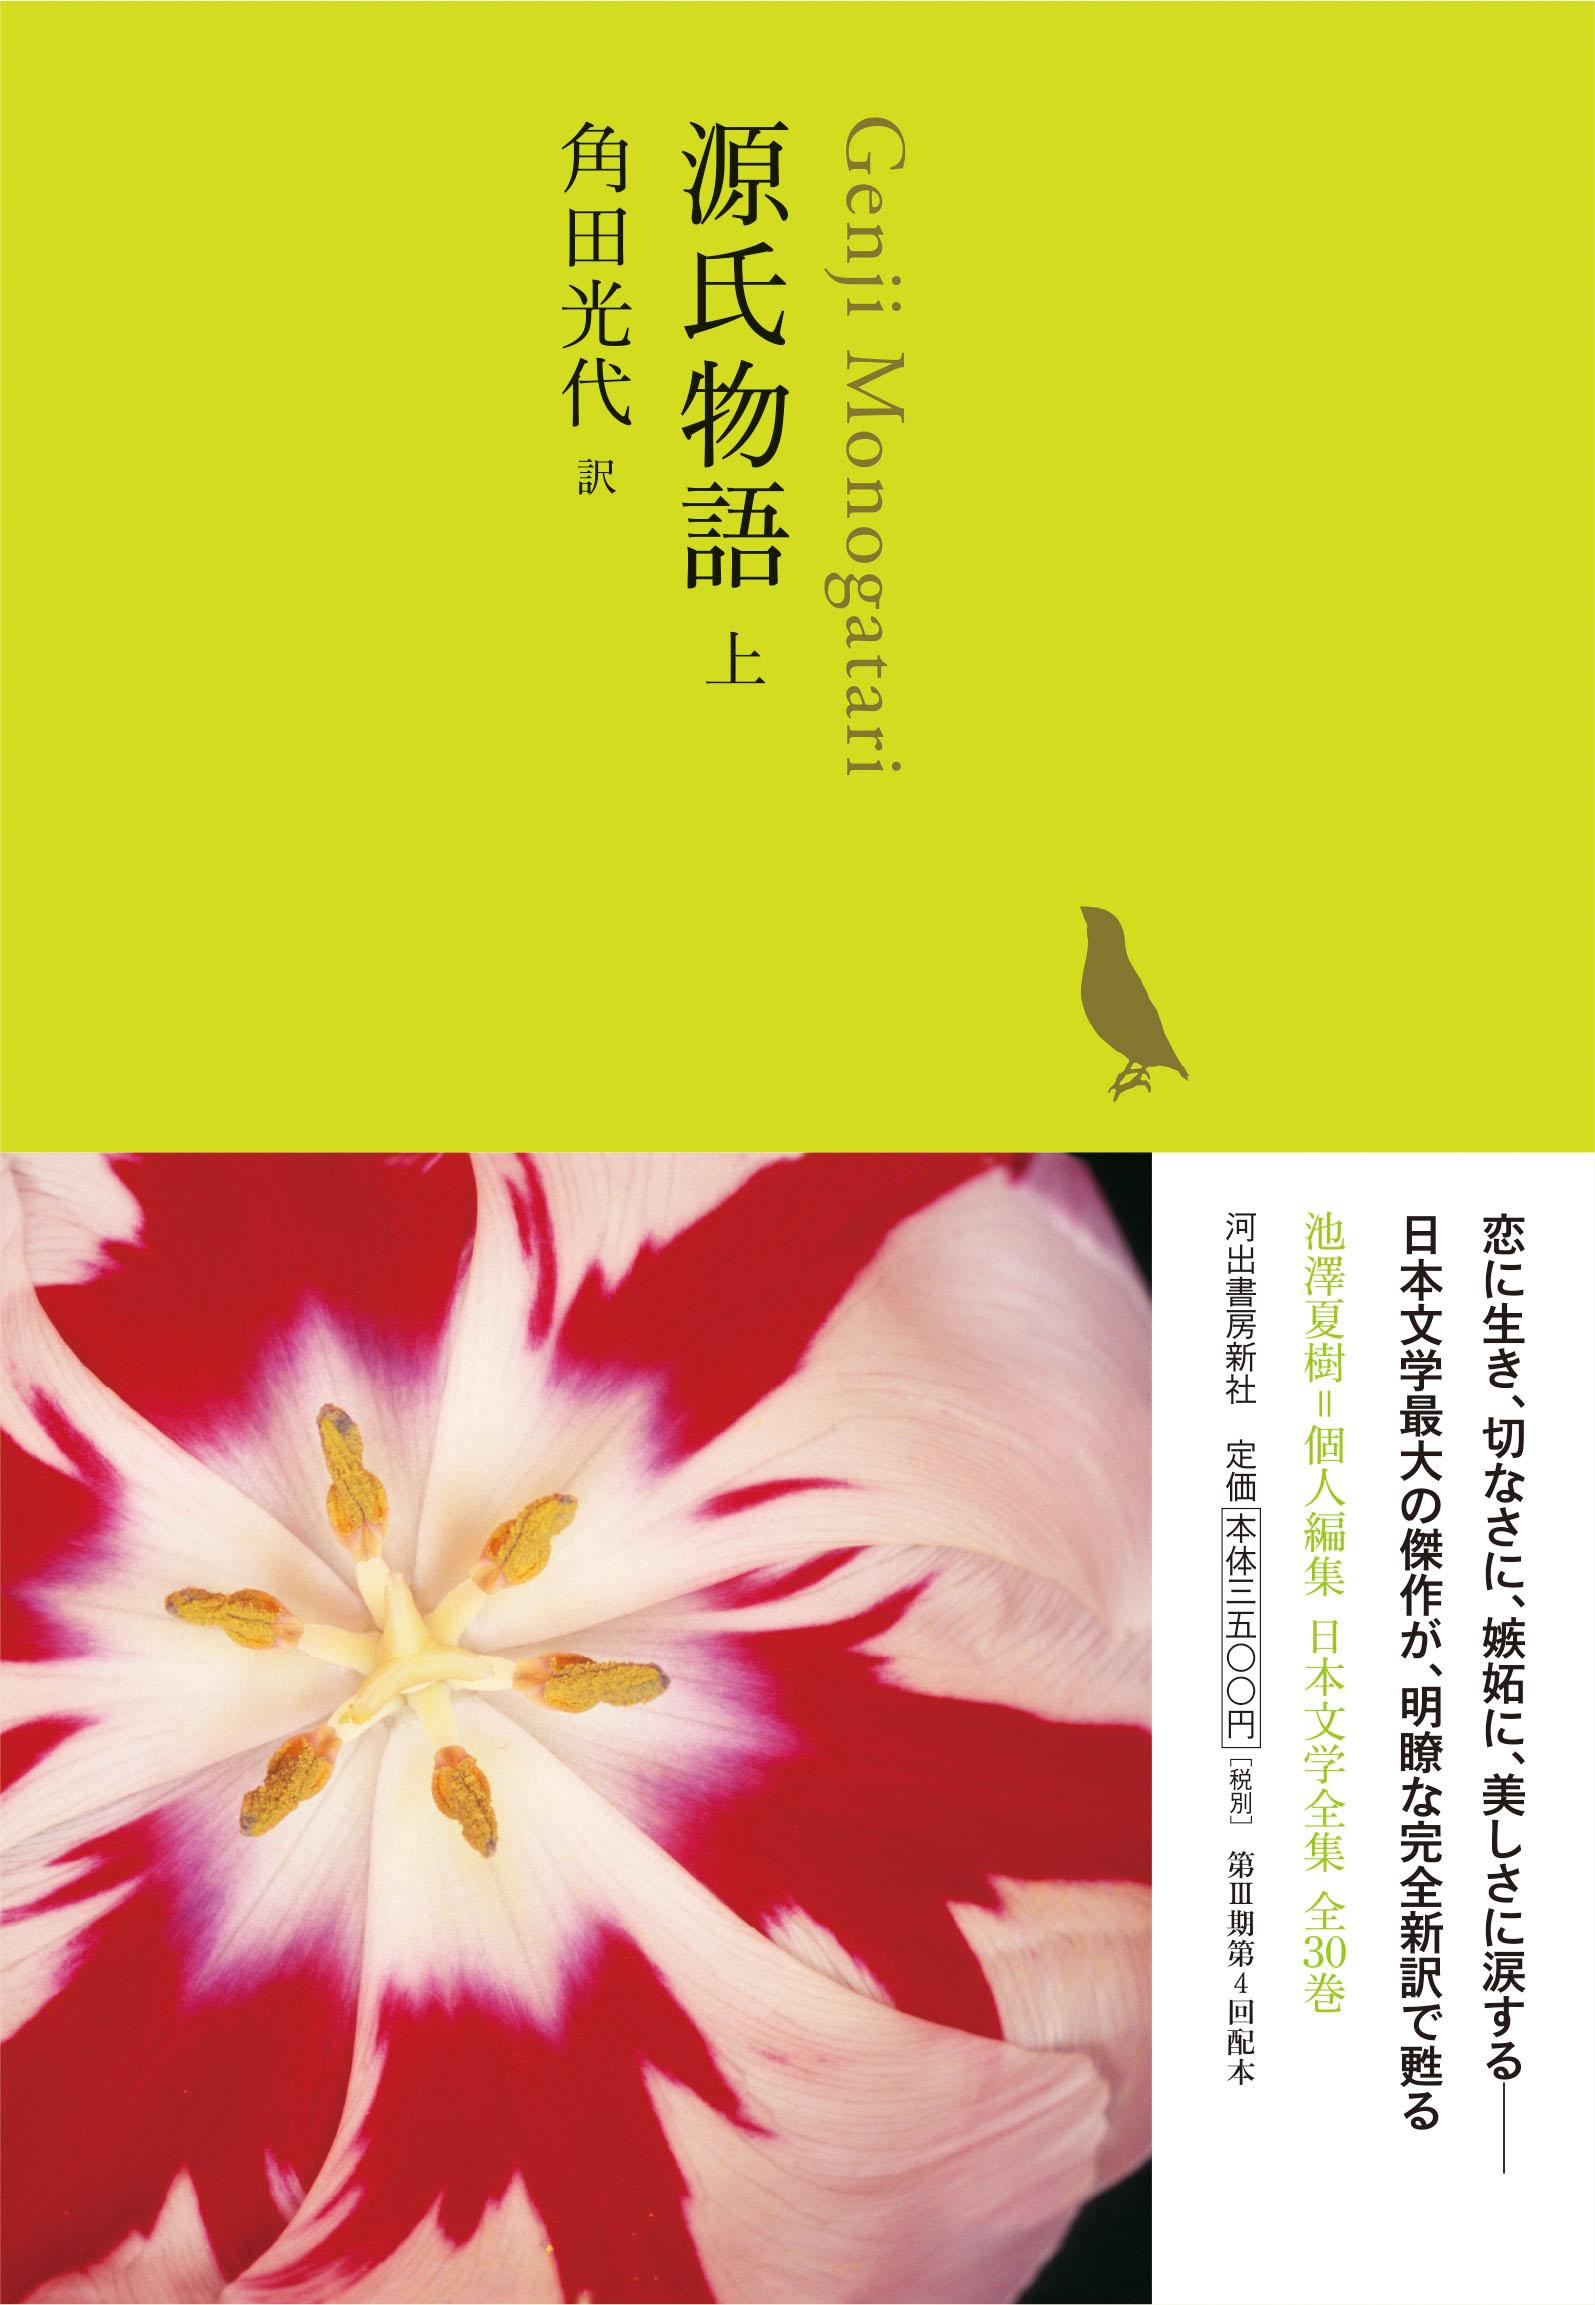 http://web.kawade.co.jp/wp-content/uploads/2017/08/zenshu04web.jpg